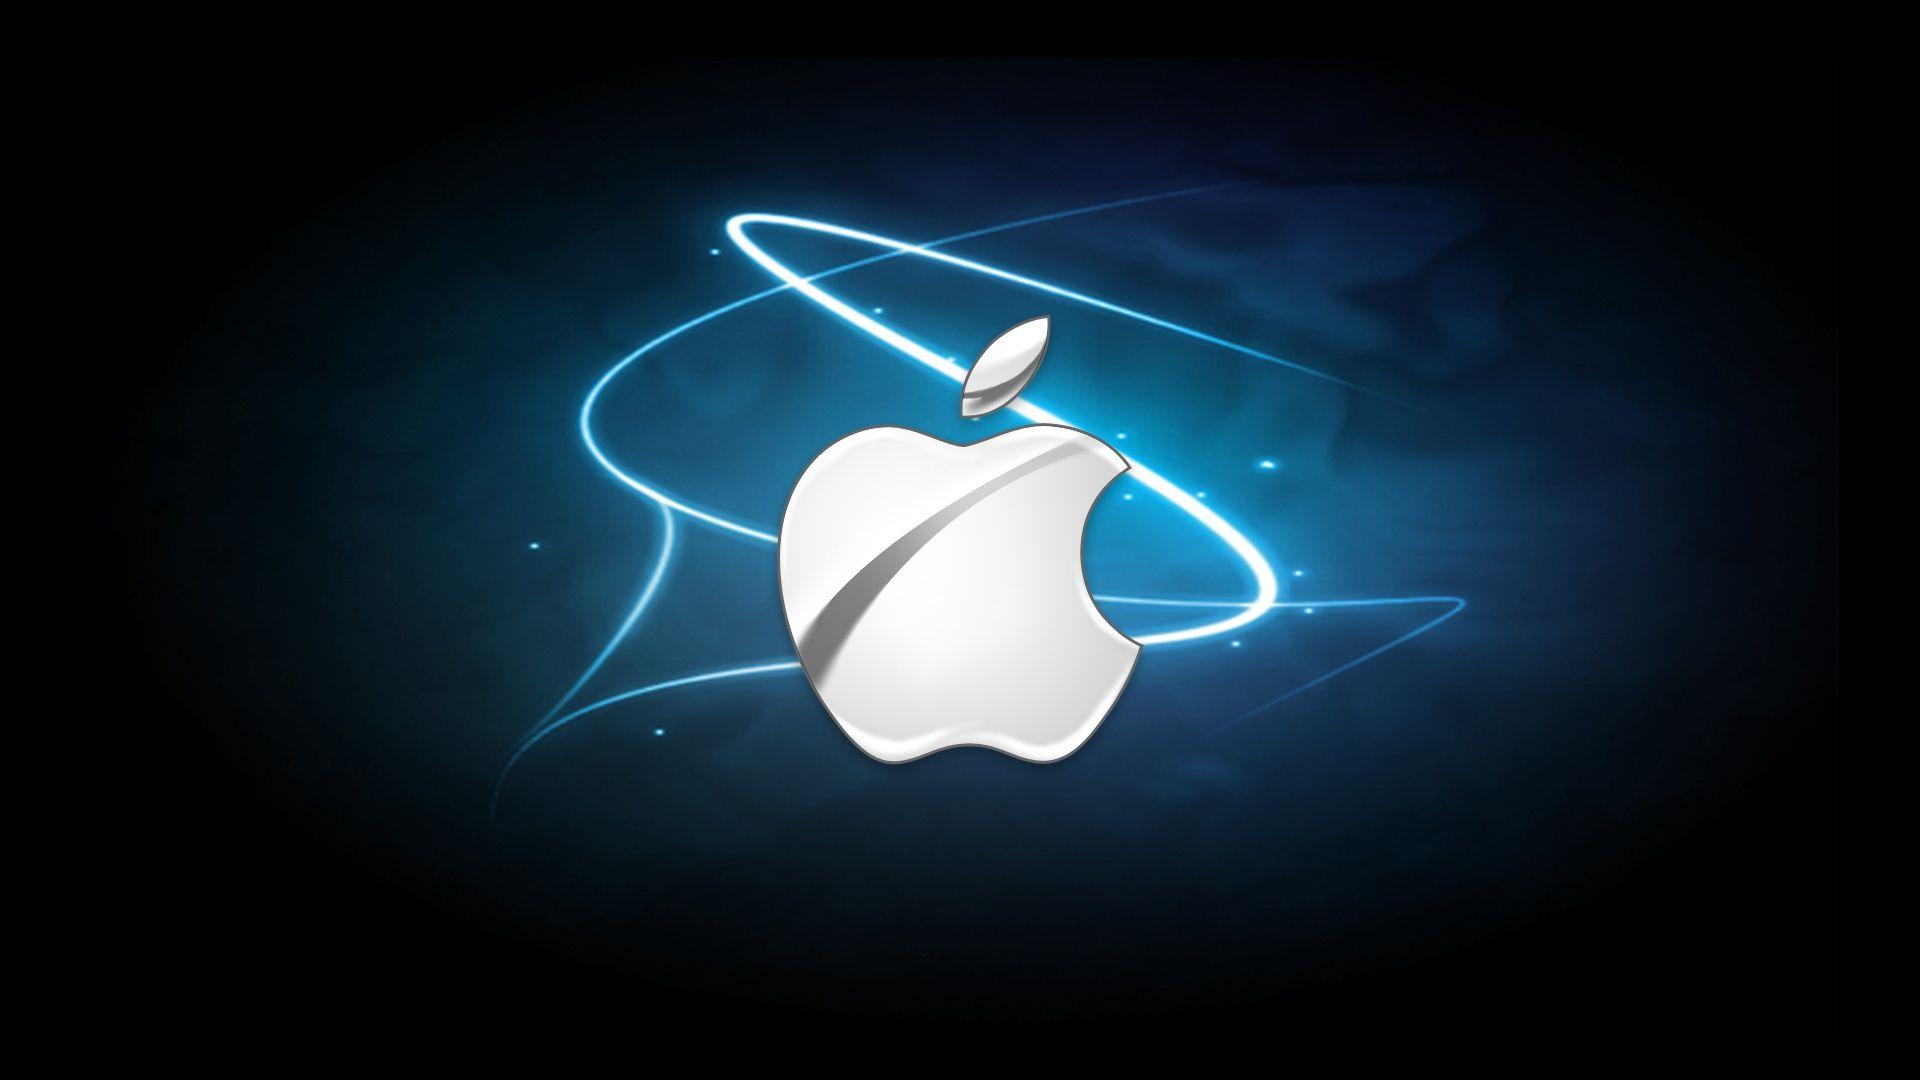 cool apple logo wallpaper #15